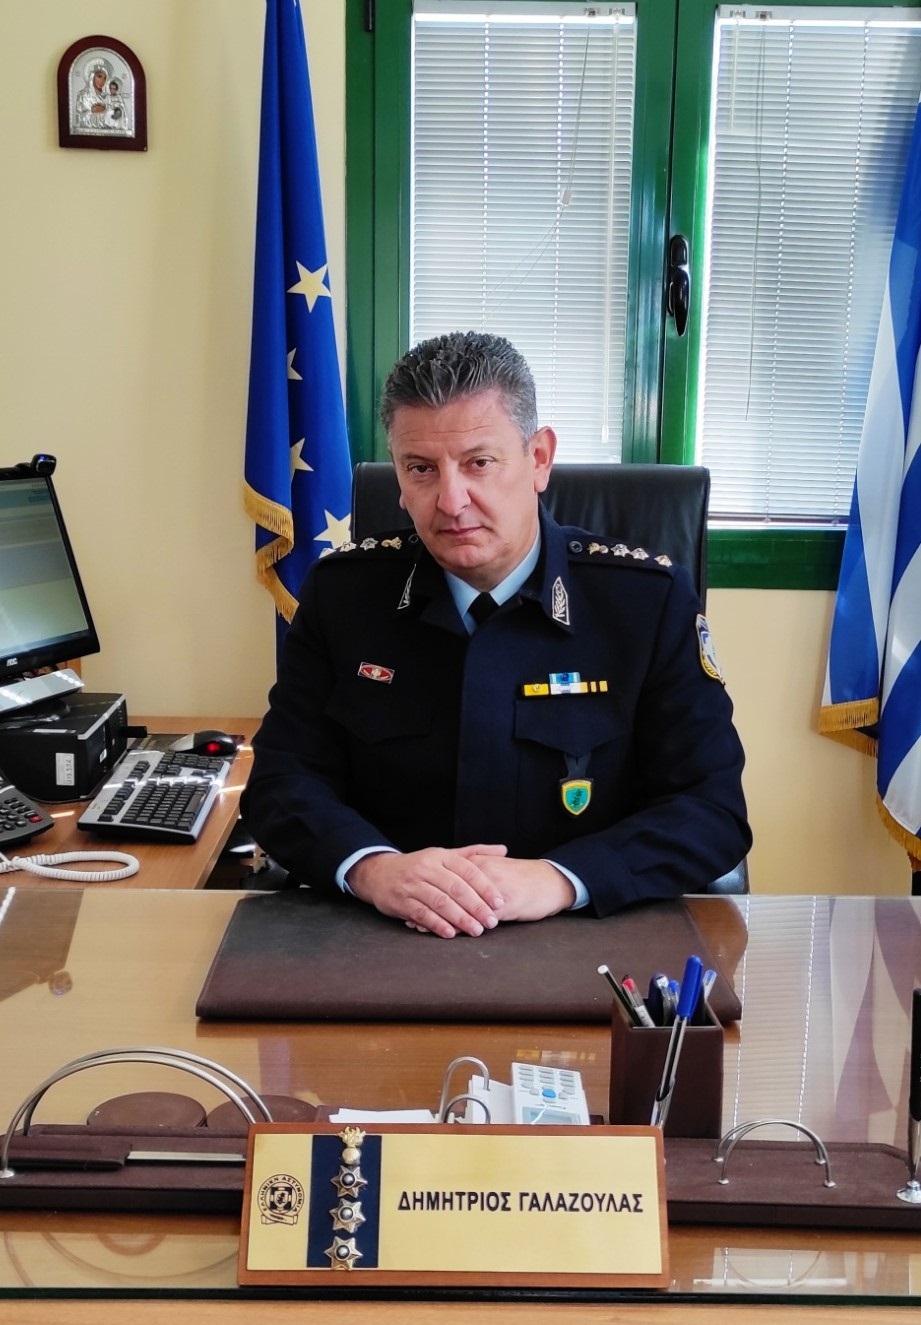 Aστυνομικός Διευθυντής Ακαρνανίας: απαγορεύονται ως 18/11 οι δημόσιες υπαίθριες συναθροίσεις με τέσσερα ή περισσότερα άτομα